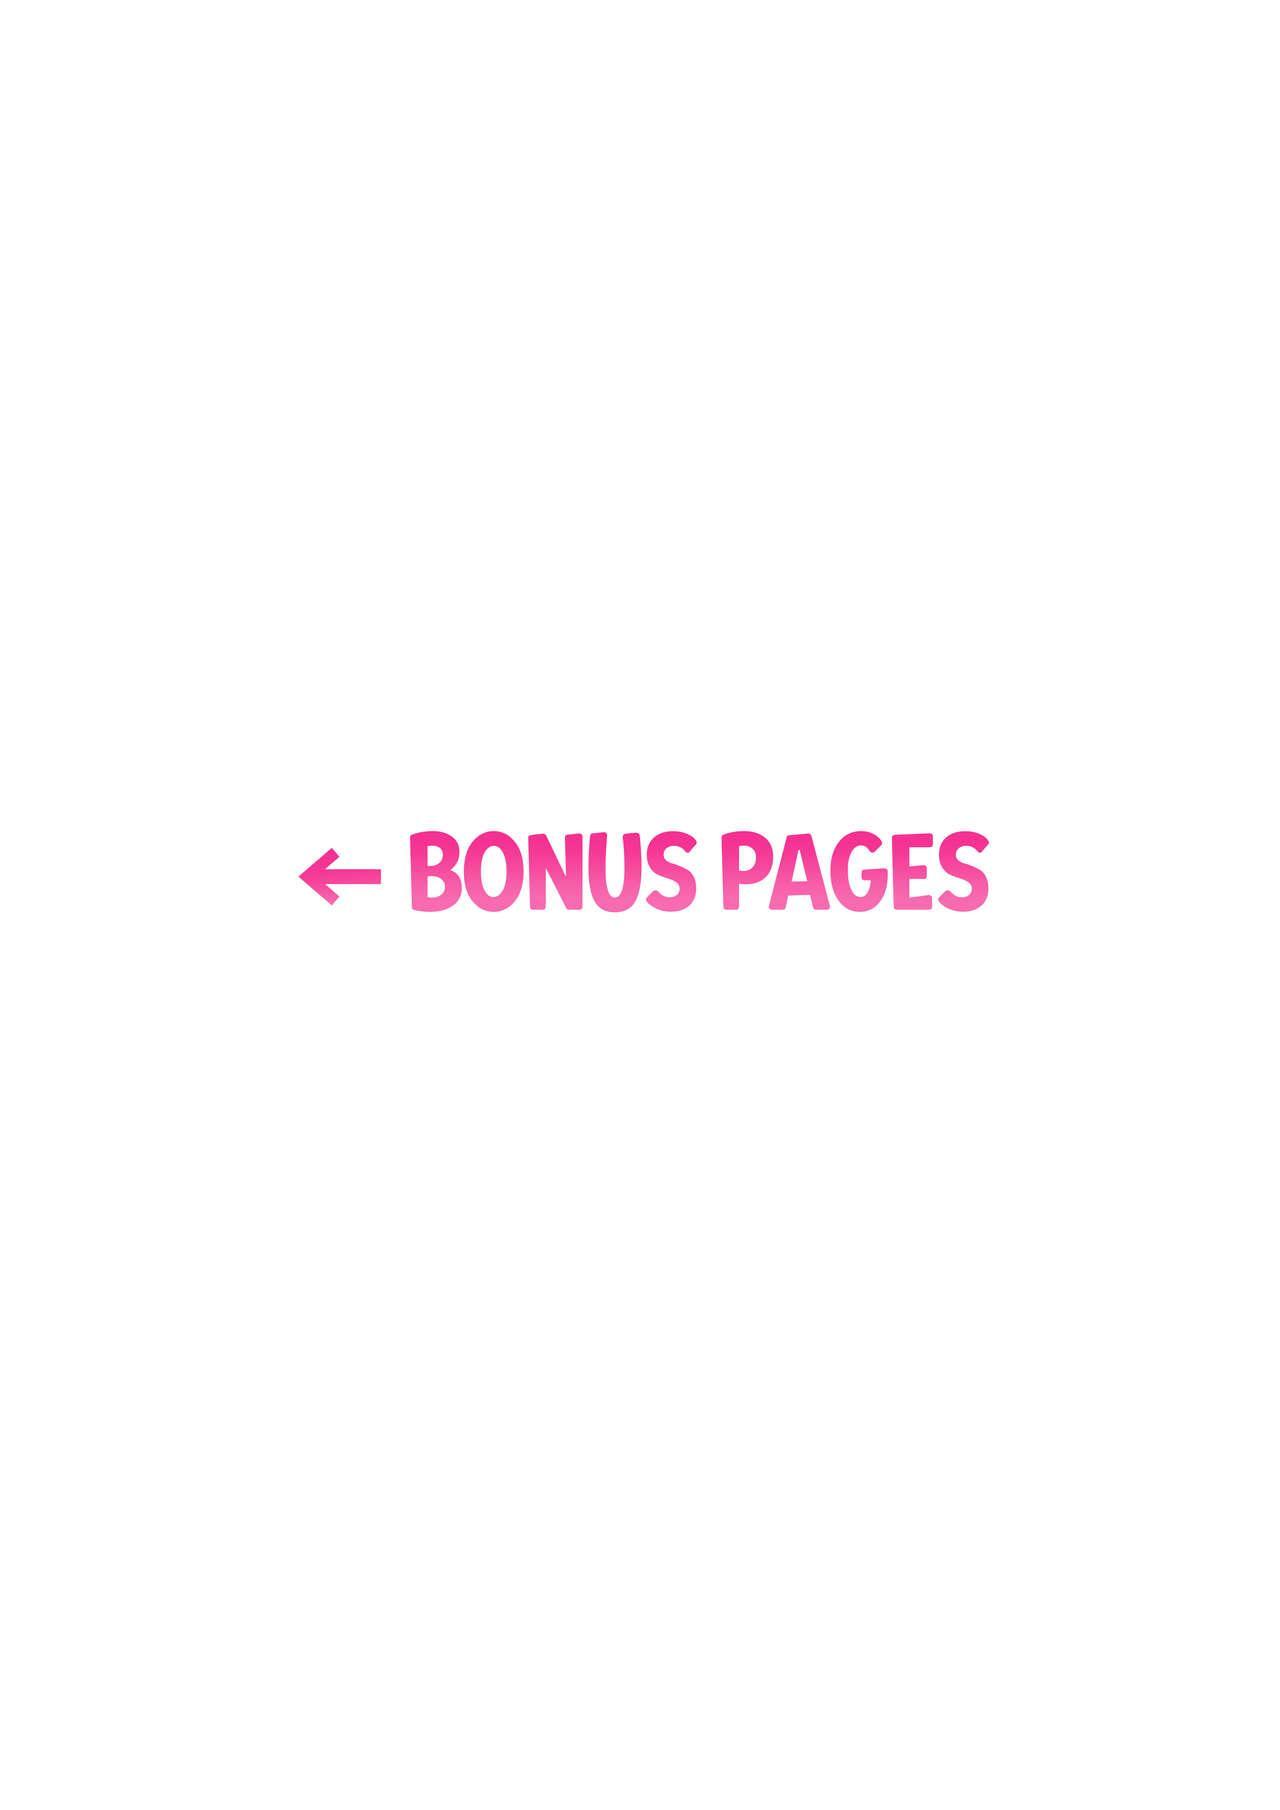 [November. (nanohana)] Bakunyuu Gal no Dosukebe Kanojo to Asa made! Icha Love Sex | Doing It With a Lewd Big-Titted Gyaru Until Morning!? Lovey-Dovey Sex (Azur Lane) [English] [HentaIsLife Scans + Hellsin] 21